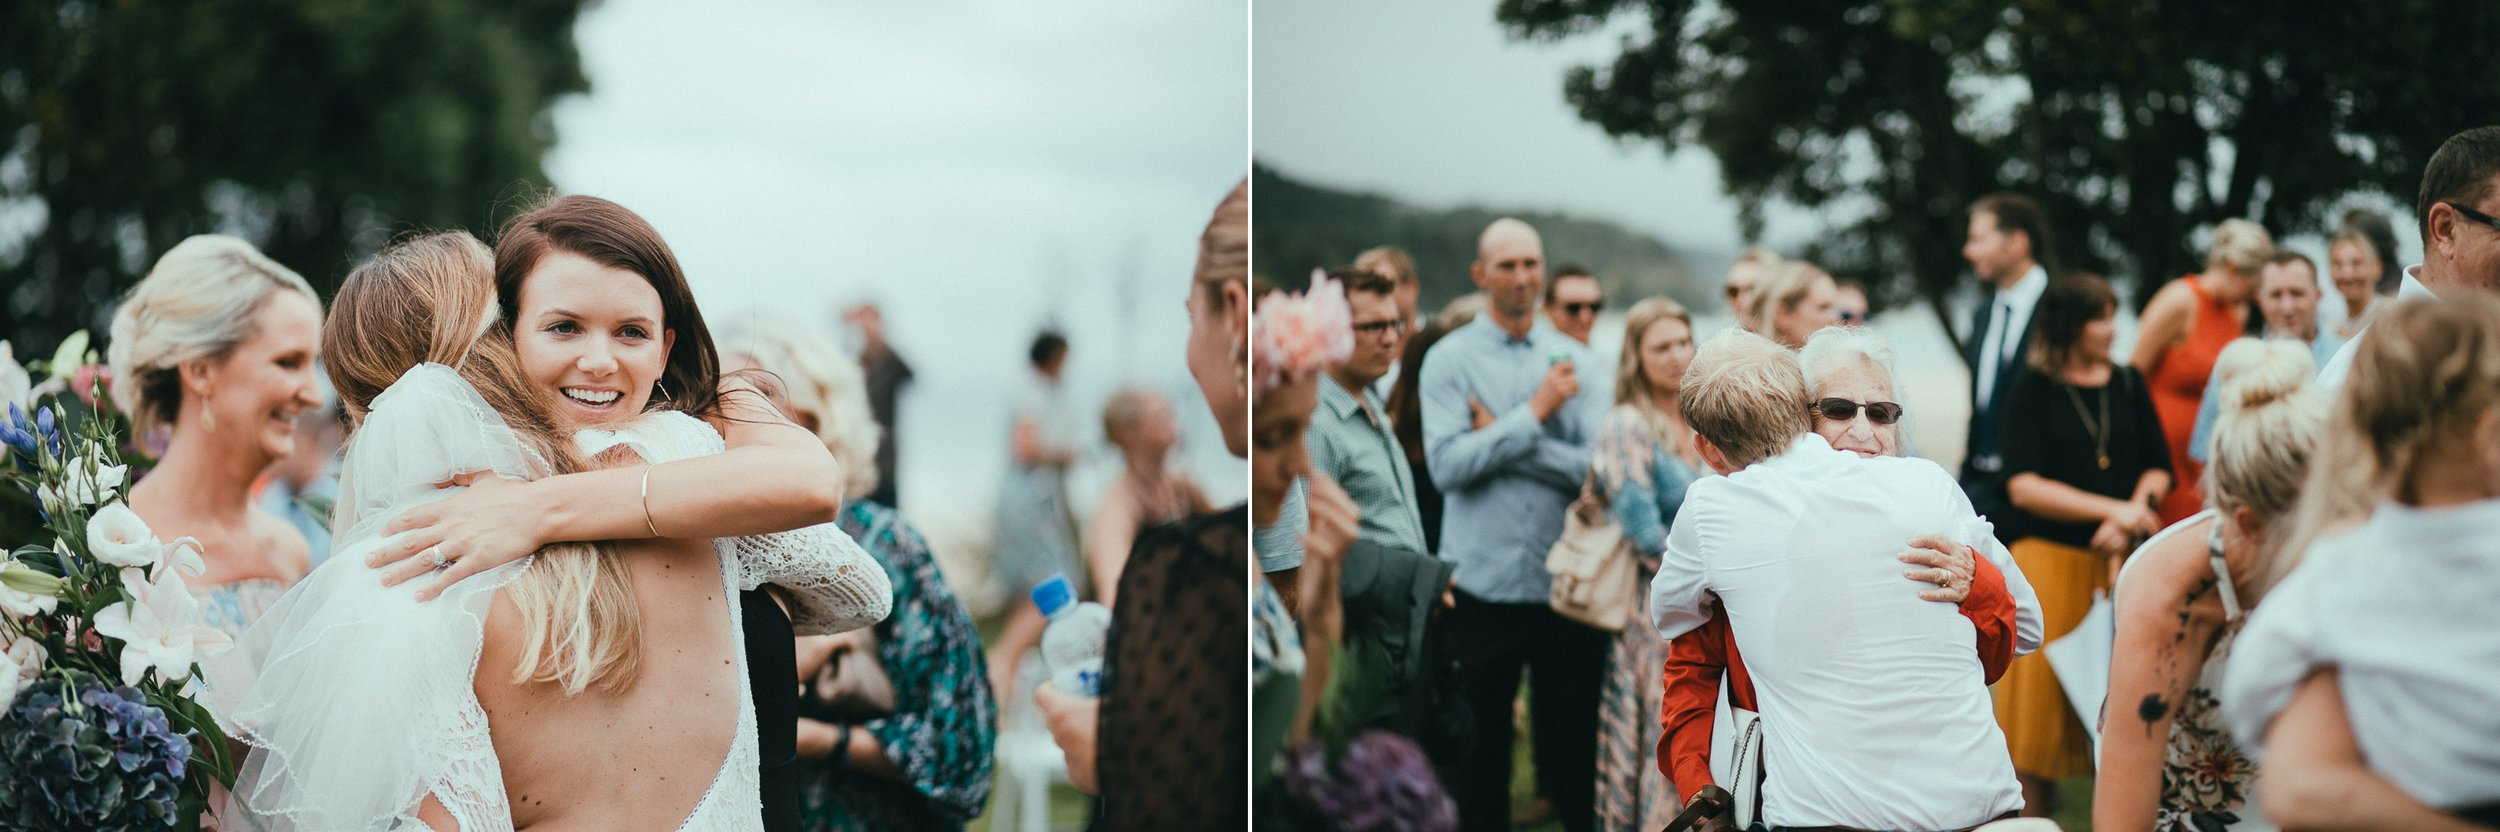 emotional-wedding-new-zealand89.jpg